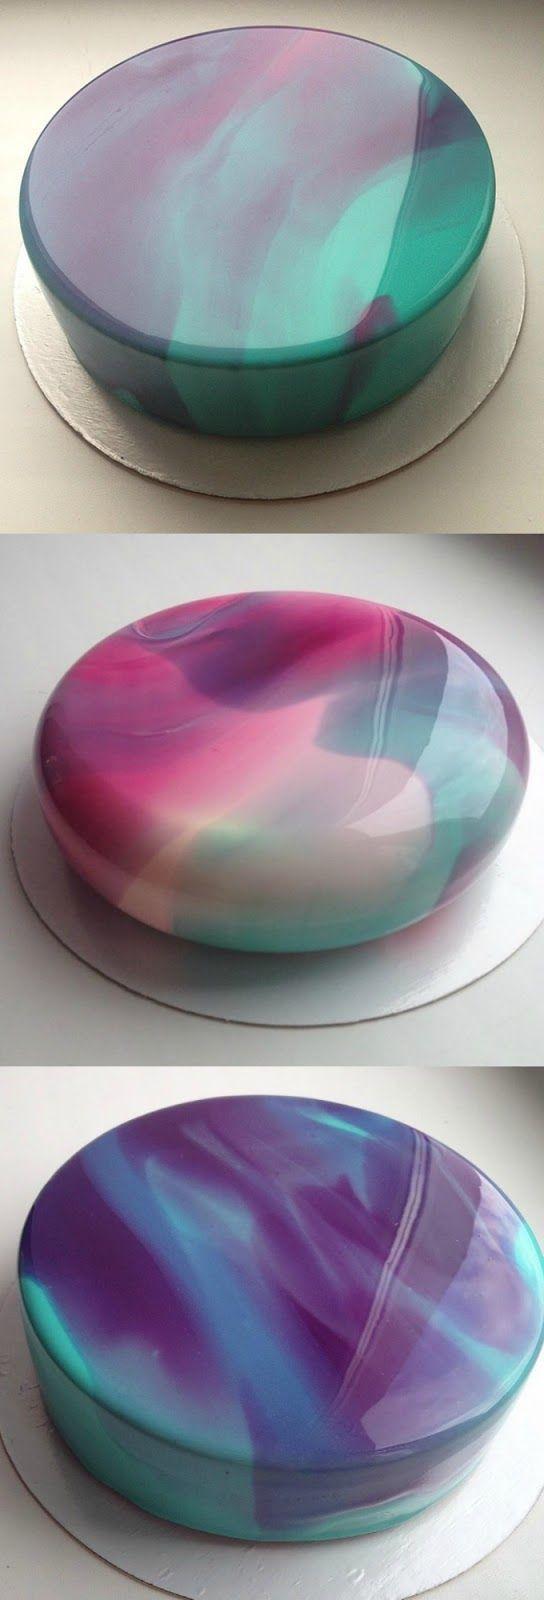 Mirror Glazed Cake Perfection   Daily Recipes